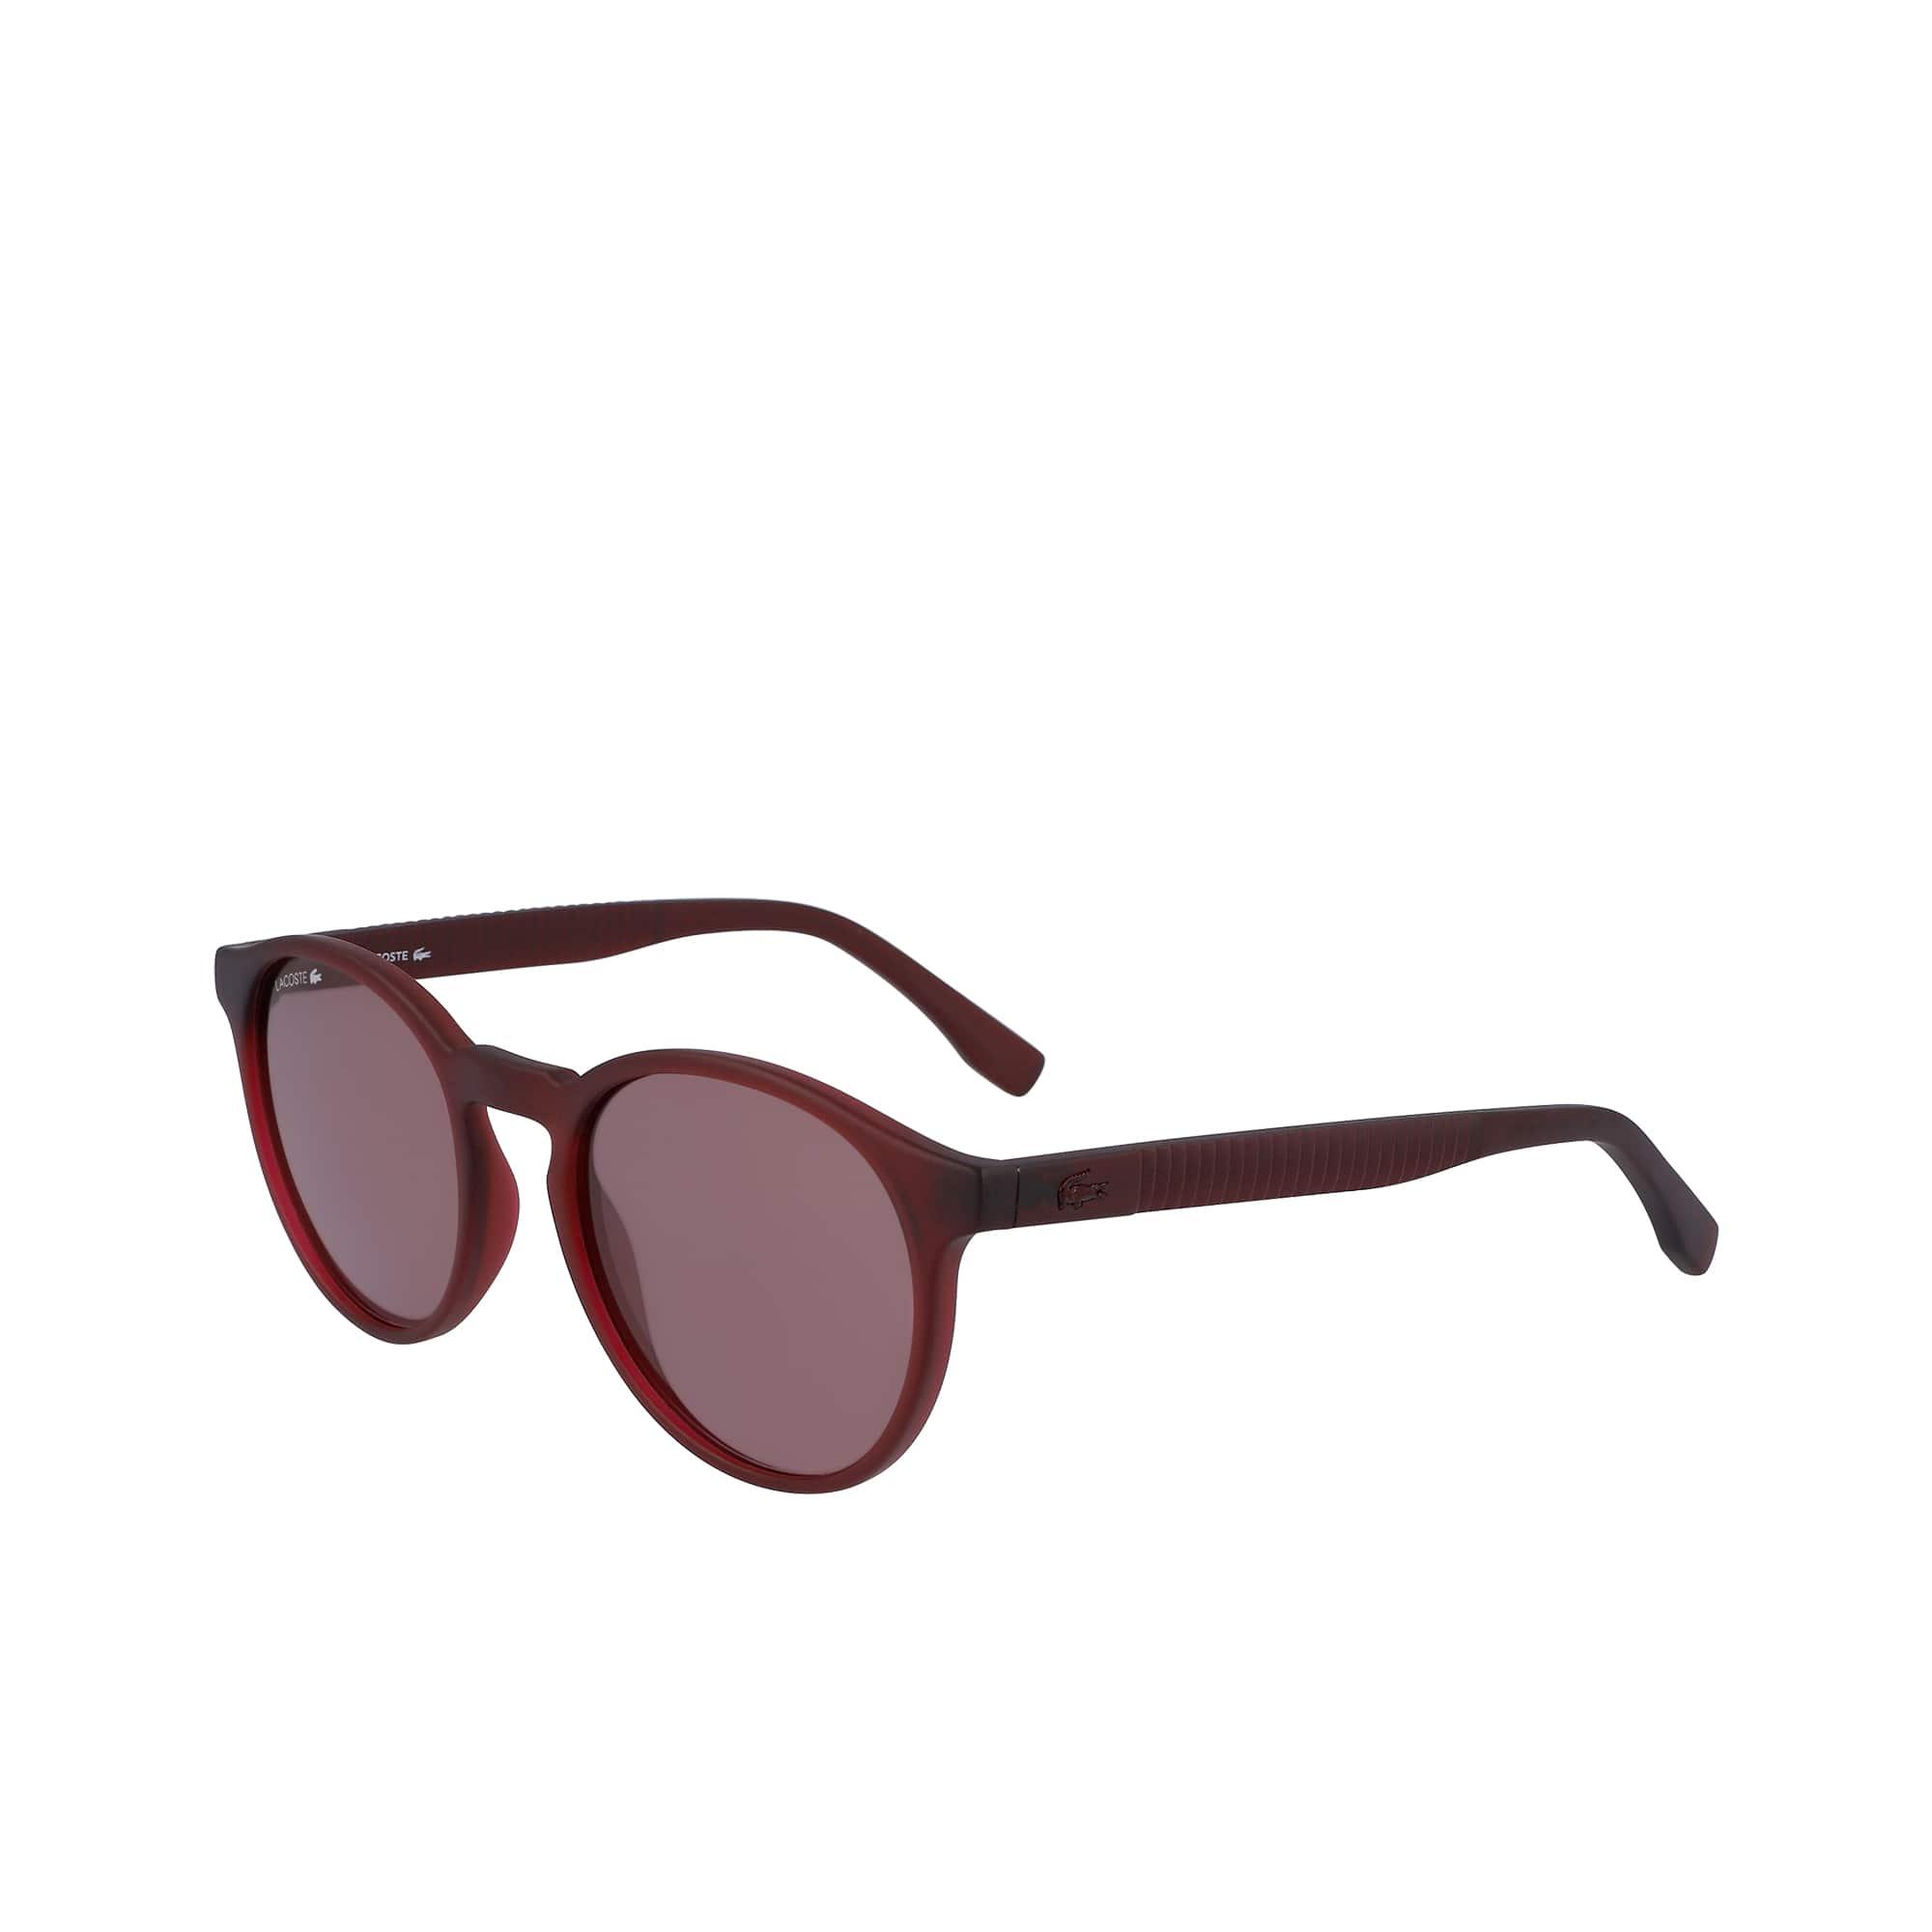 5ece102bf8 Round Plastic Plissé Sunglasses